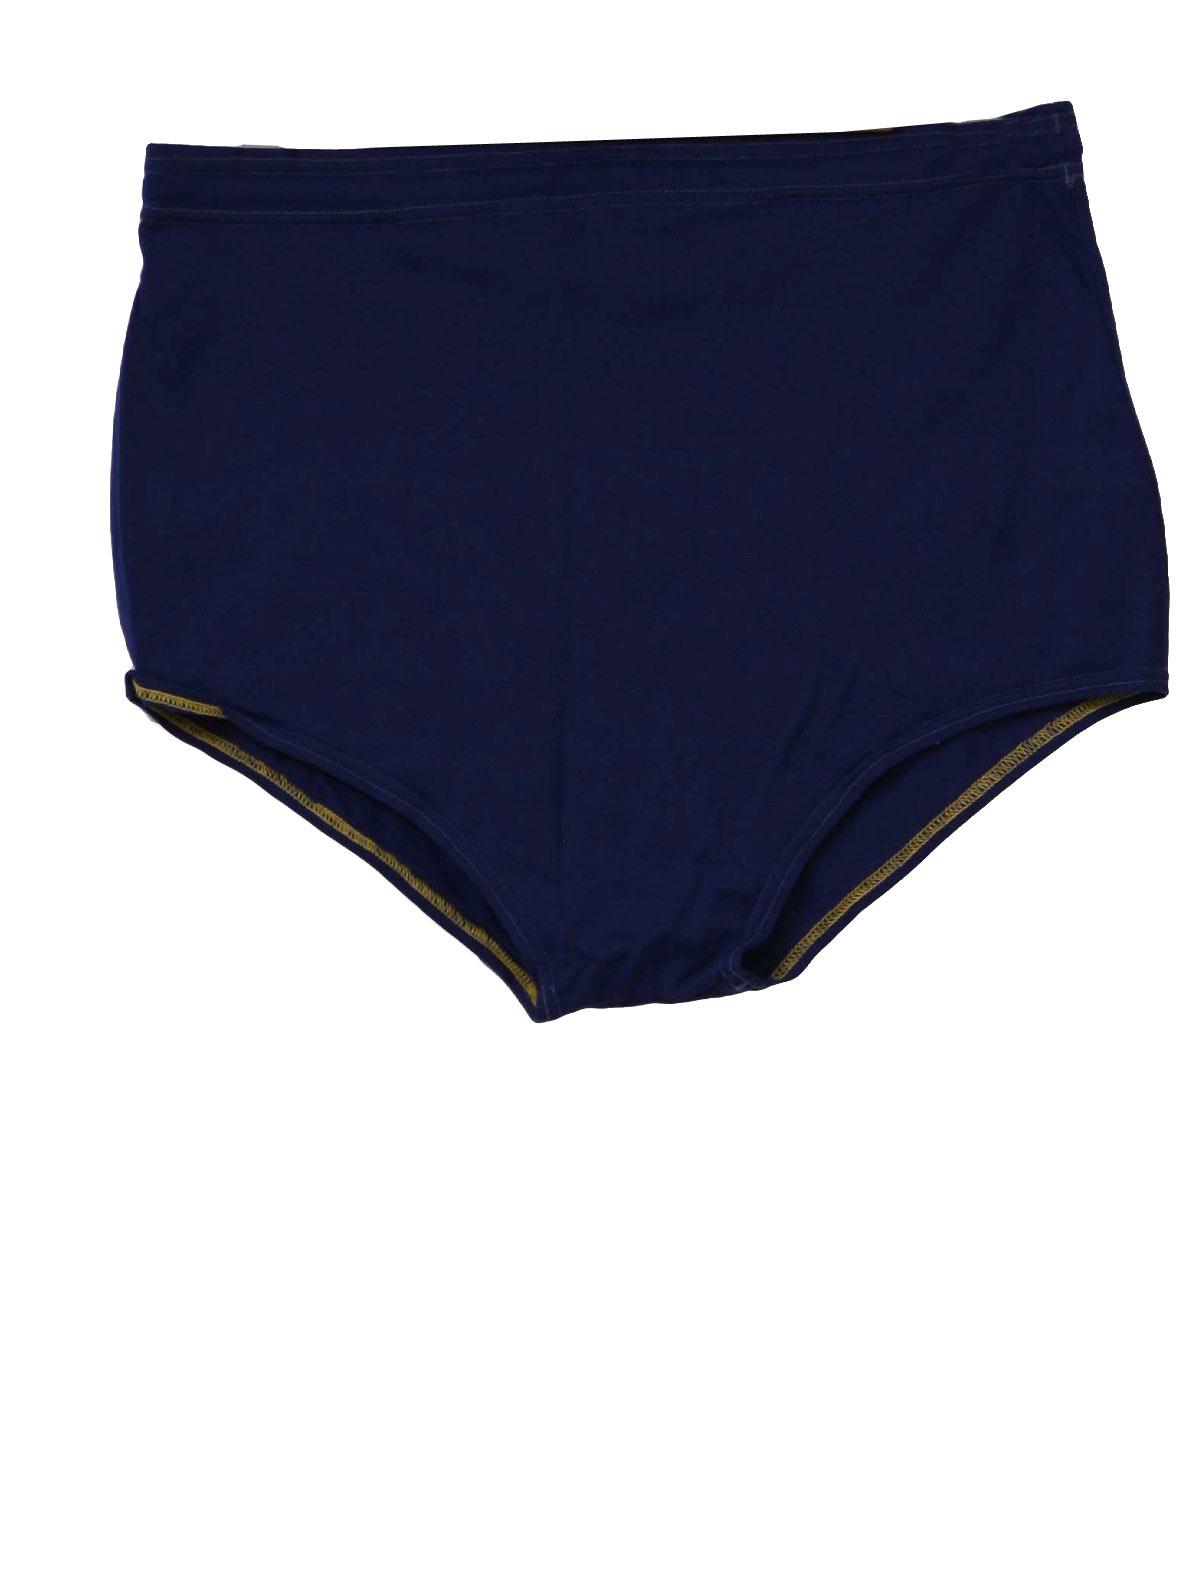 Retro 1960's Swimsuit/Swimwear (Dolphin) : 60s -Dolphin- Mens blue ...